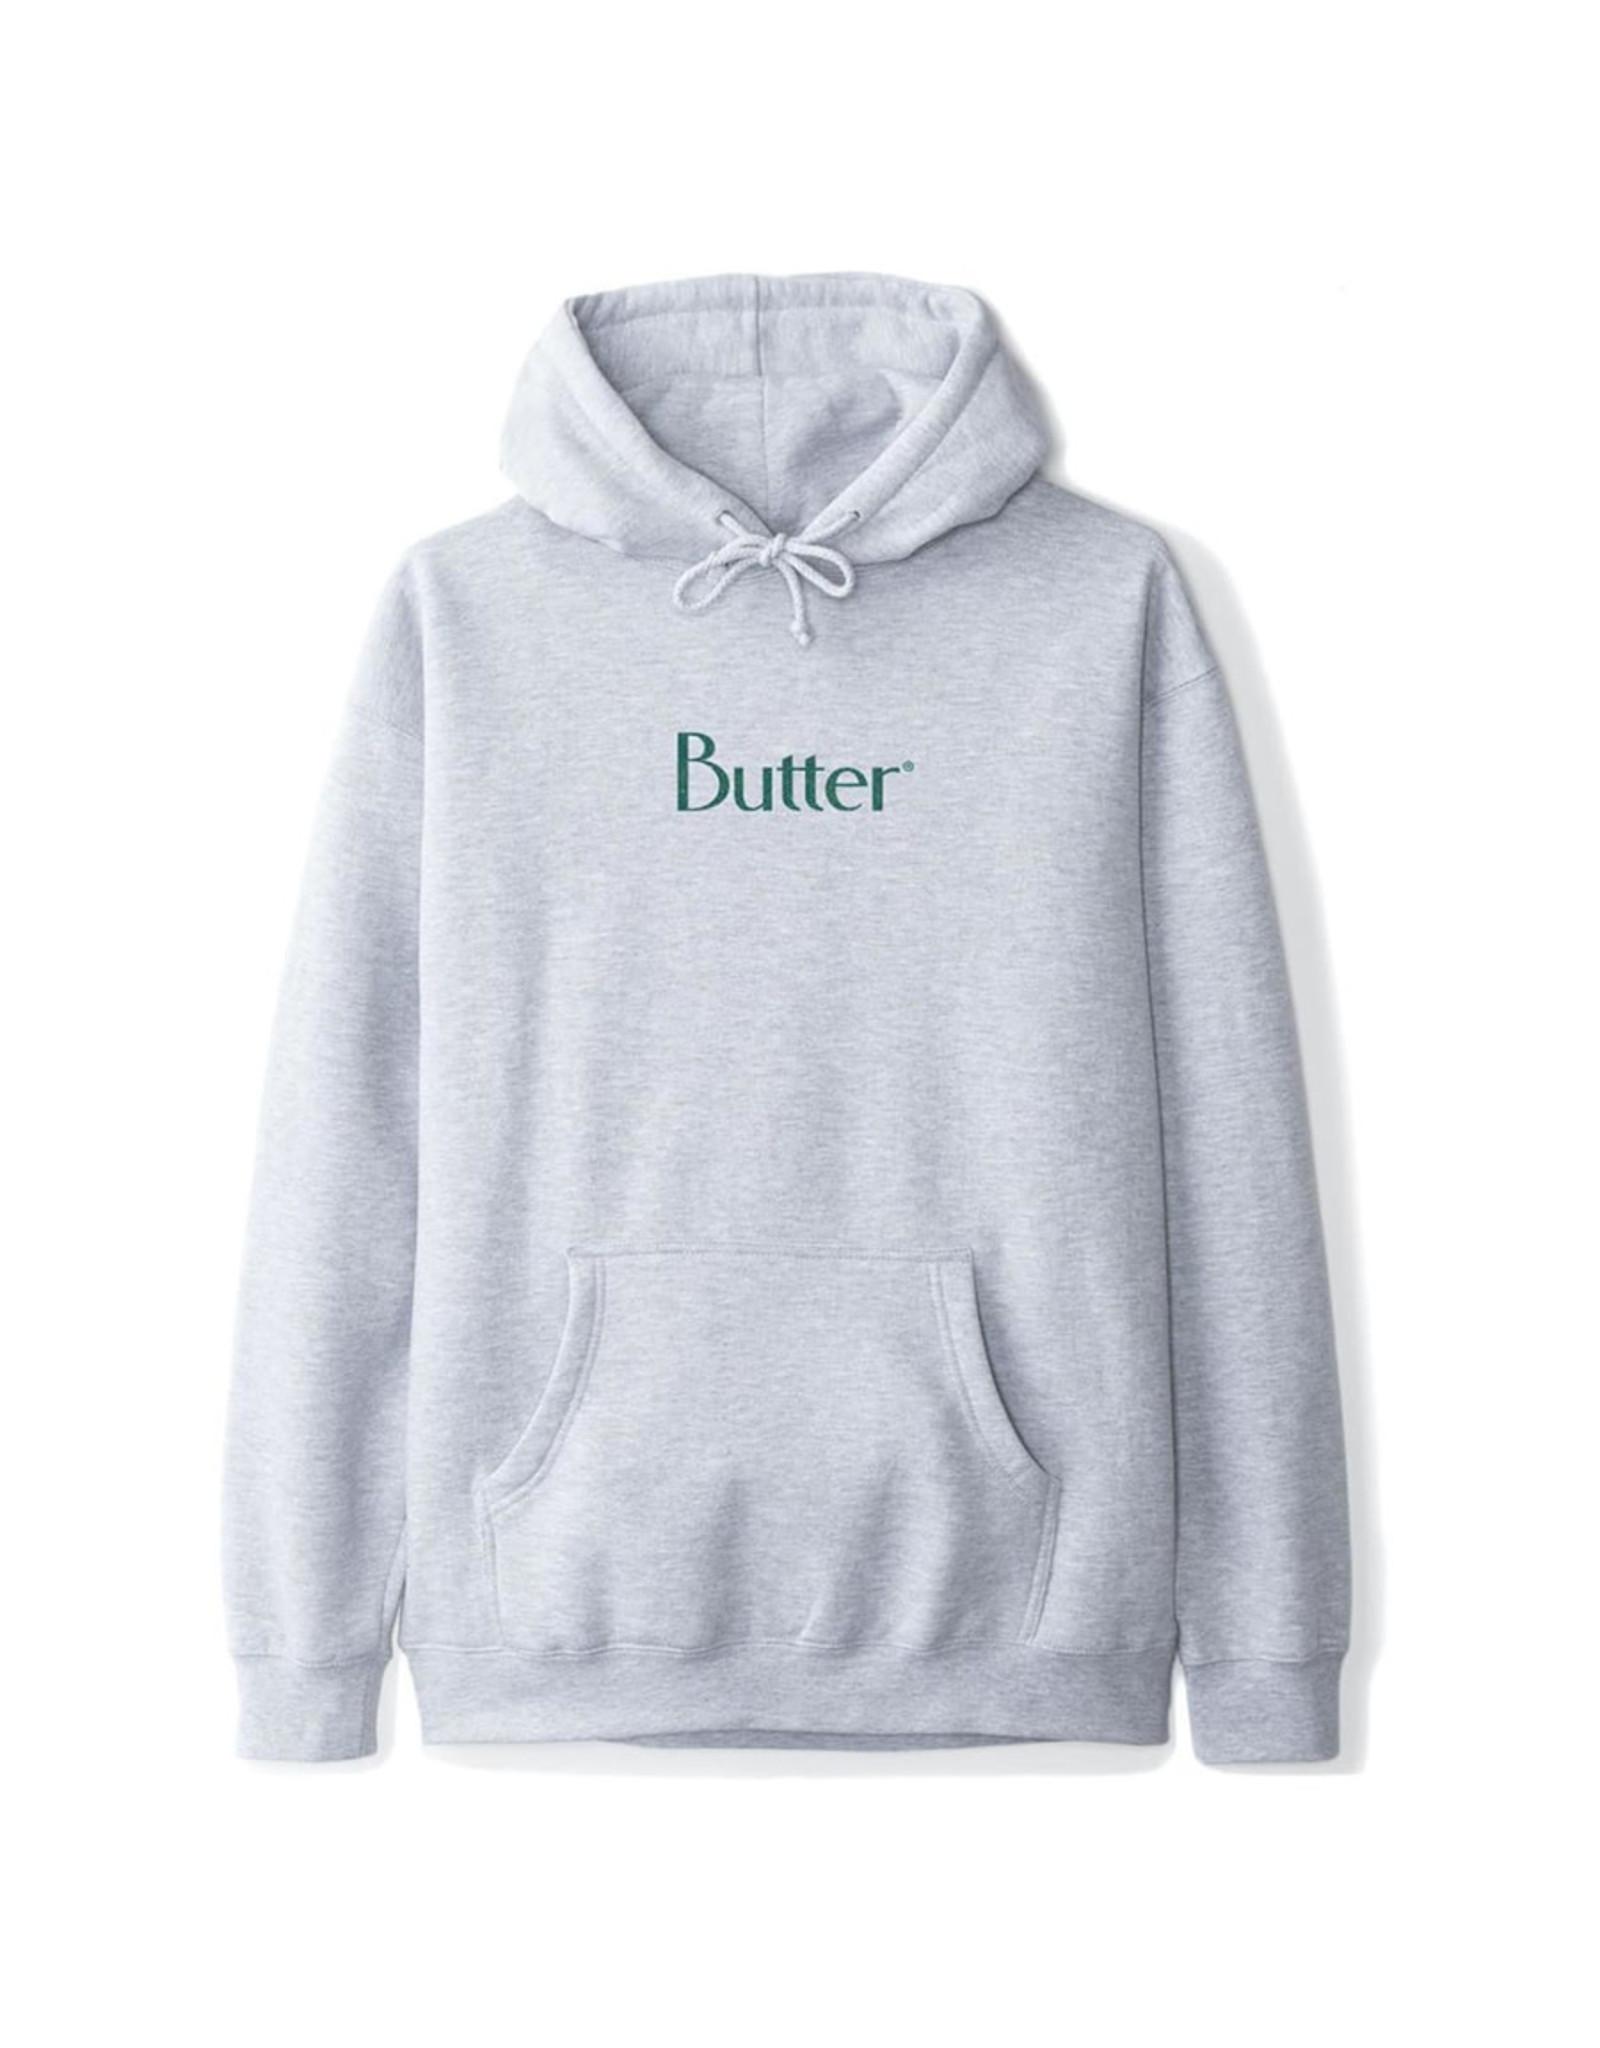 Butter Goods Butter Goods Hood Speckle Classic Logo Pullover (Ash Grey)